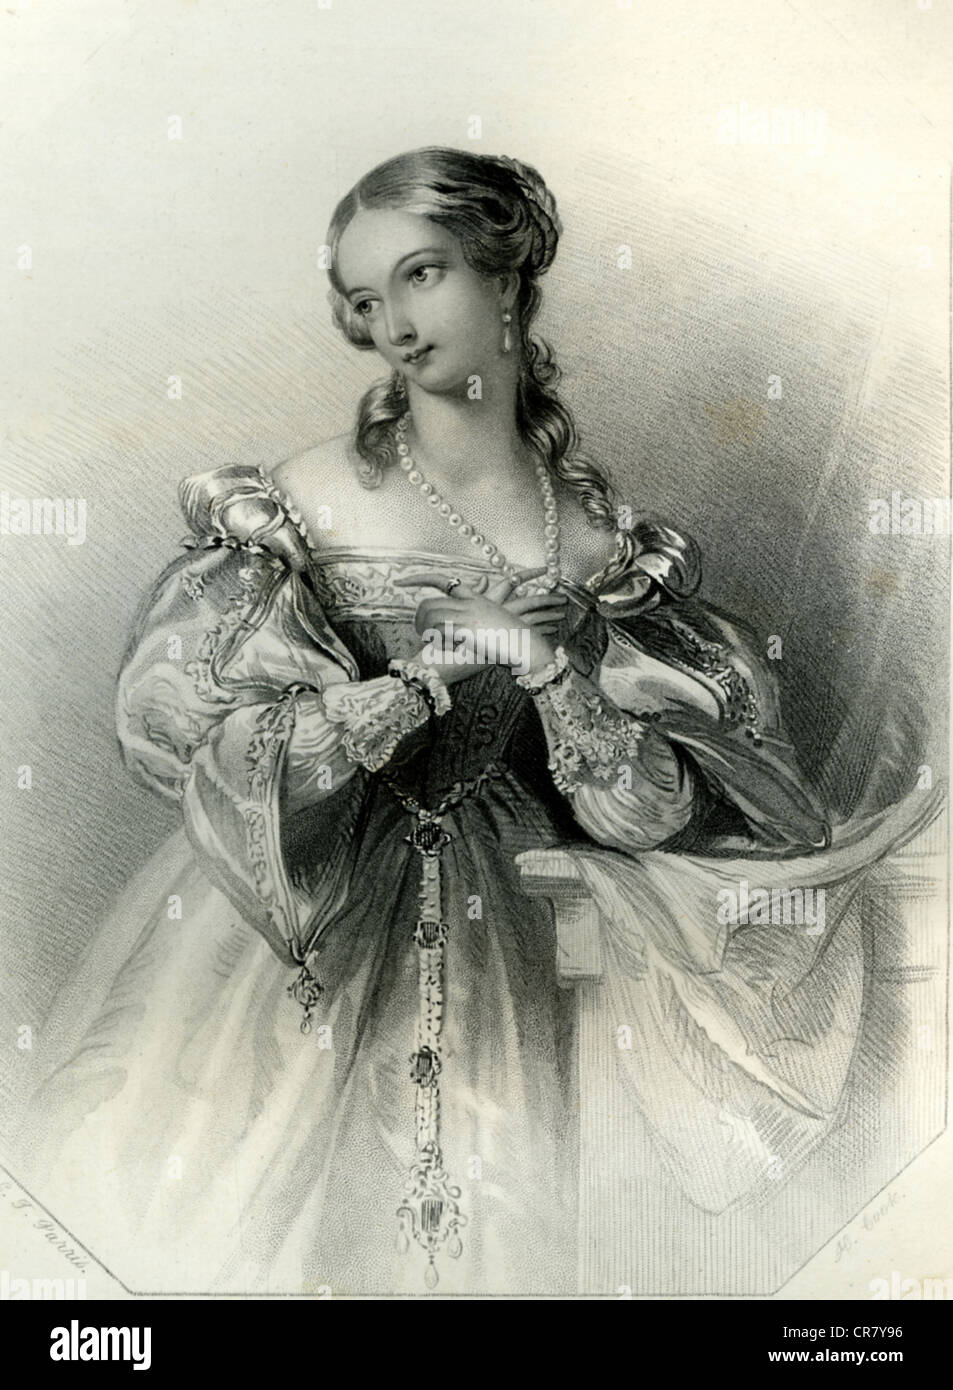 Juliet, Shakespearean heroine in 'Romeo and Juliet', historical illustration, 1868 - Stock Image